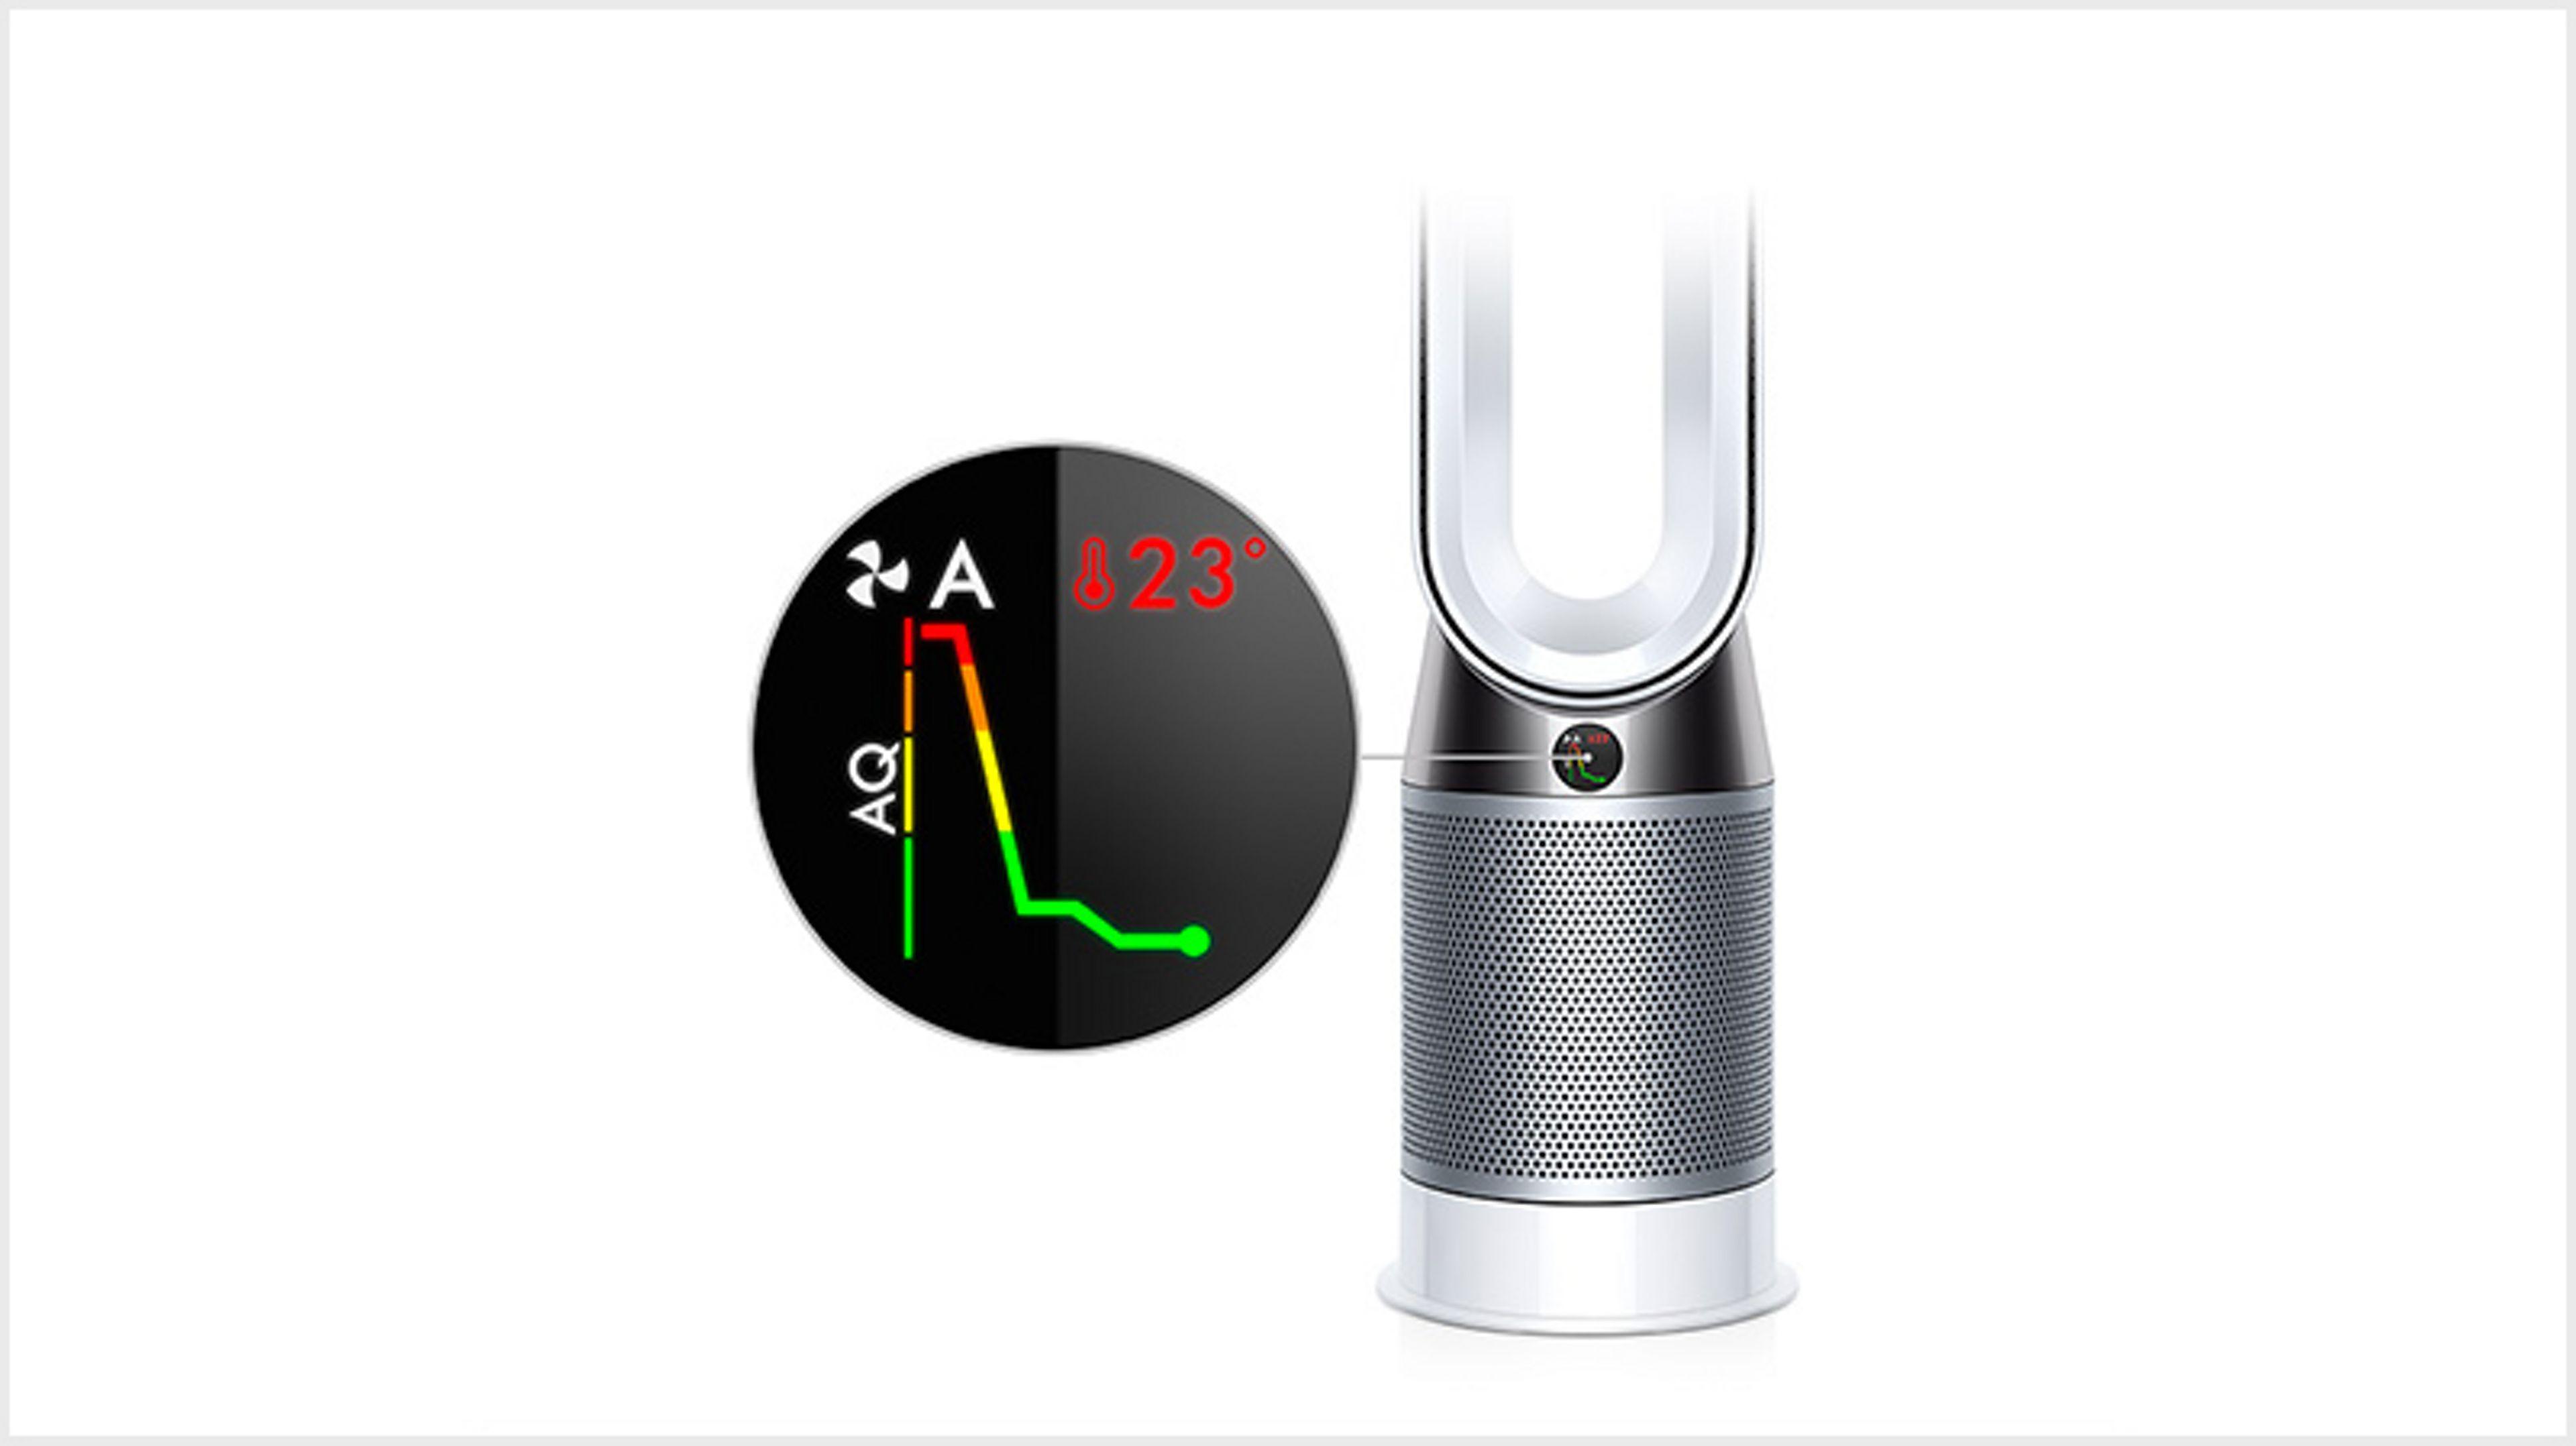 Hot and cool purifer sensor